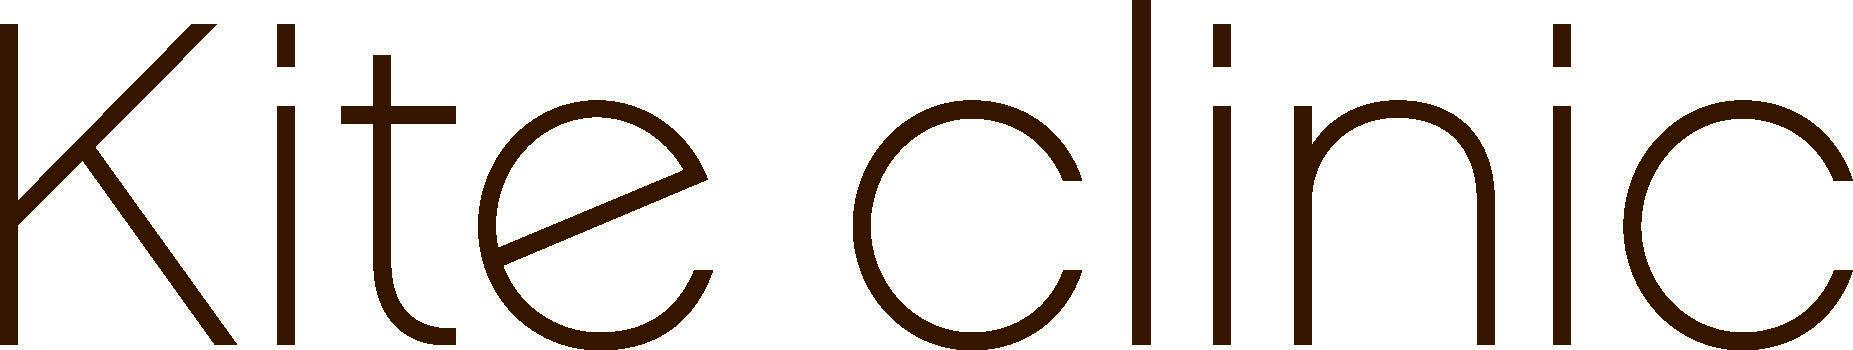 Gerrard Kite Logo[1].jpg